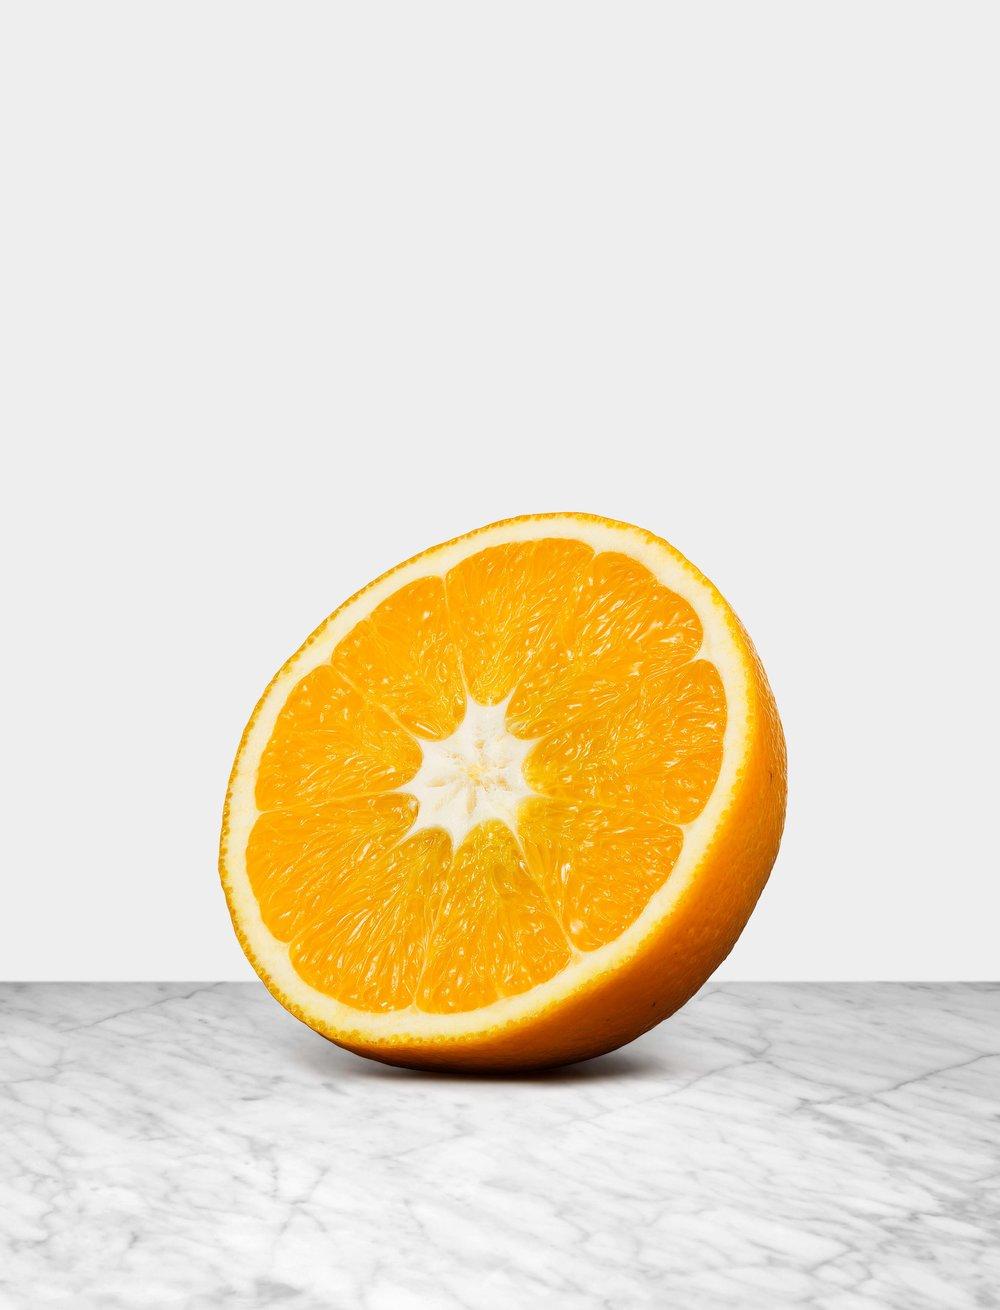 Apelsin kopiera kopia 4.jpg